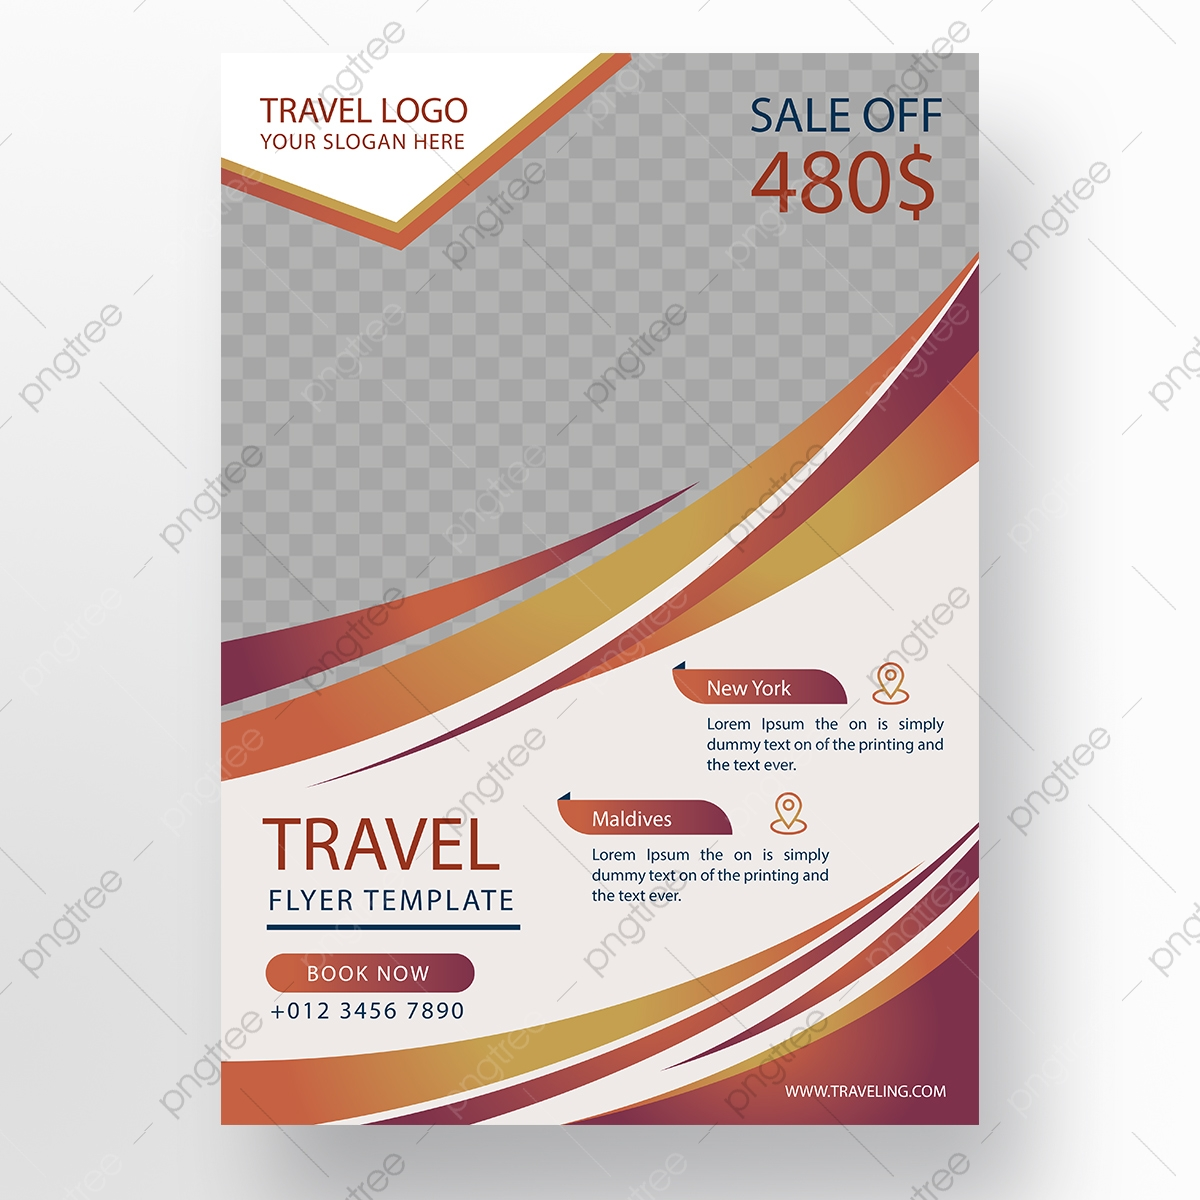 Travel Flyer Posters Design Templates Free Download Template For Free Download On Pngtree,Boutique Heavy Modern Party Wear Designer Punjabi Suits Punjabi Suit